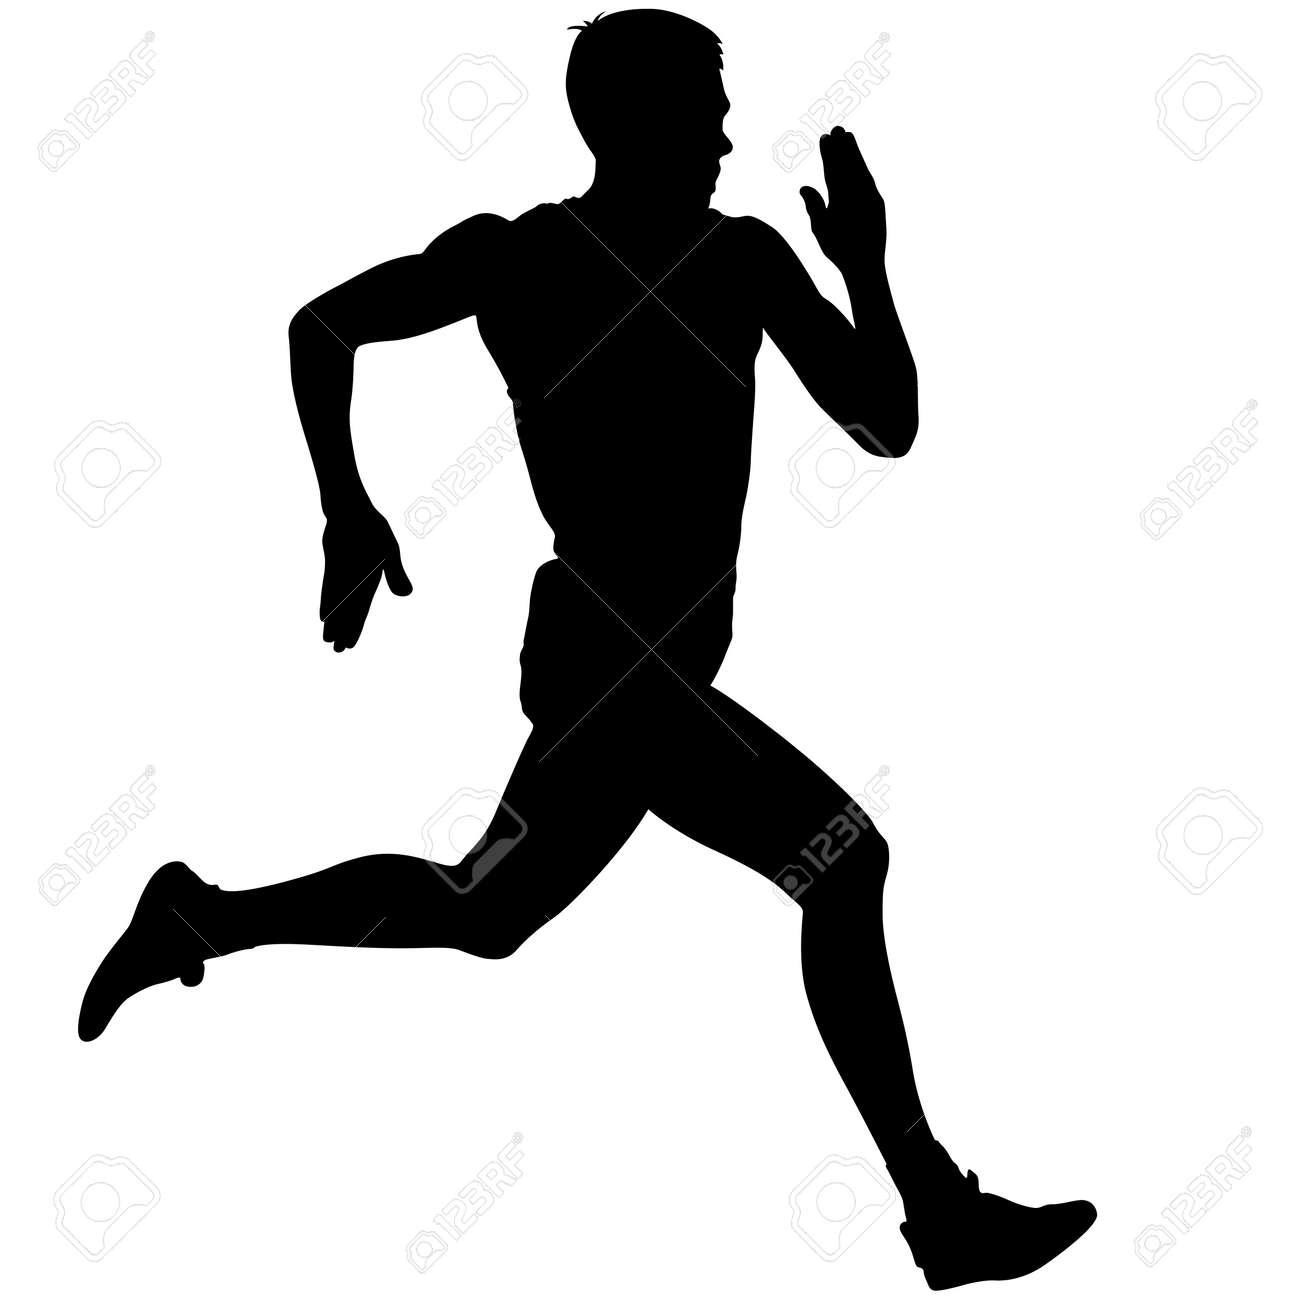 Athlete on running race, silhouettes. Vector illustration. - 36778502